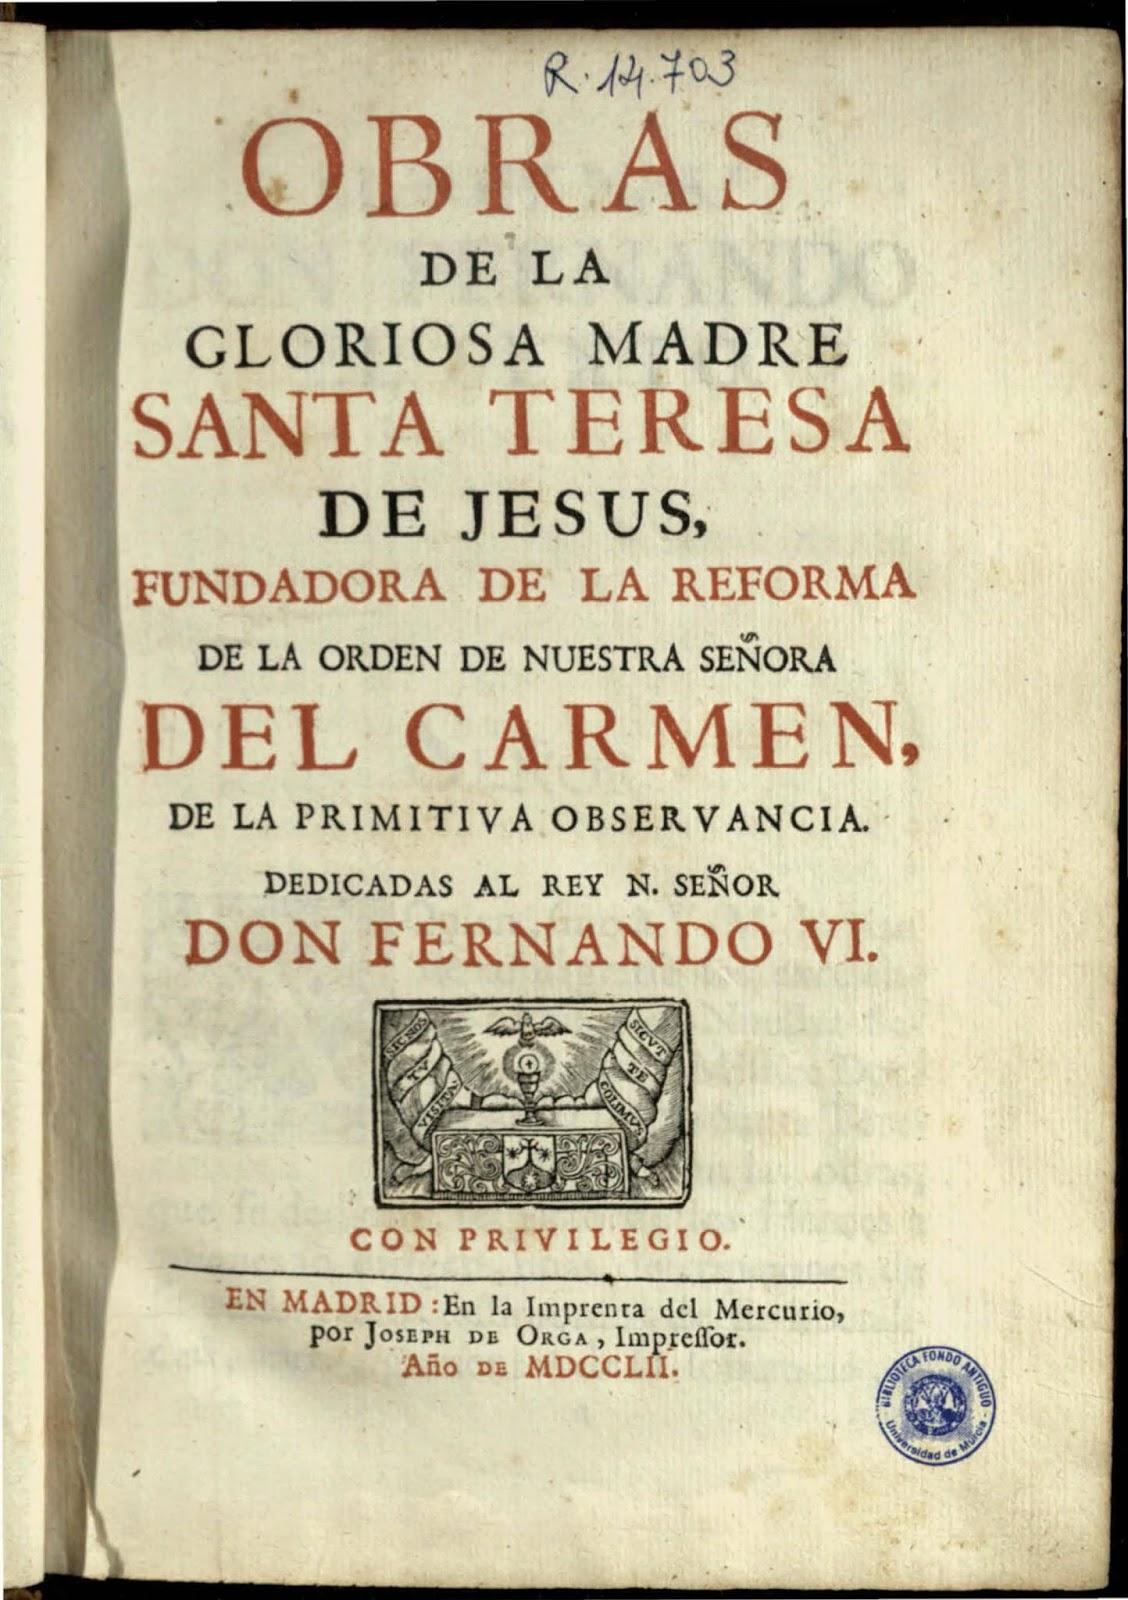 """Obras de la gloriosa Madre Santa Teresa de Jesus, fundadora de la Reforma de la Orden de Nuestra Señora del Carmen, de la Primitiva Observancia. [tomo I]"" - Teresa de Jesús, Santa (1515-1582)"